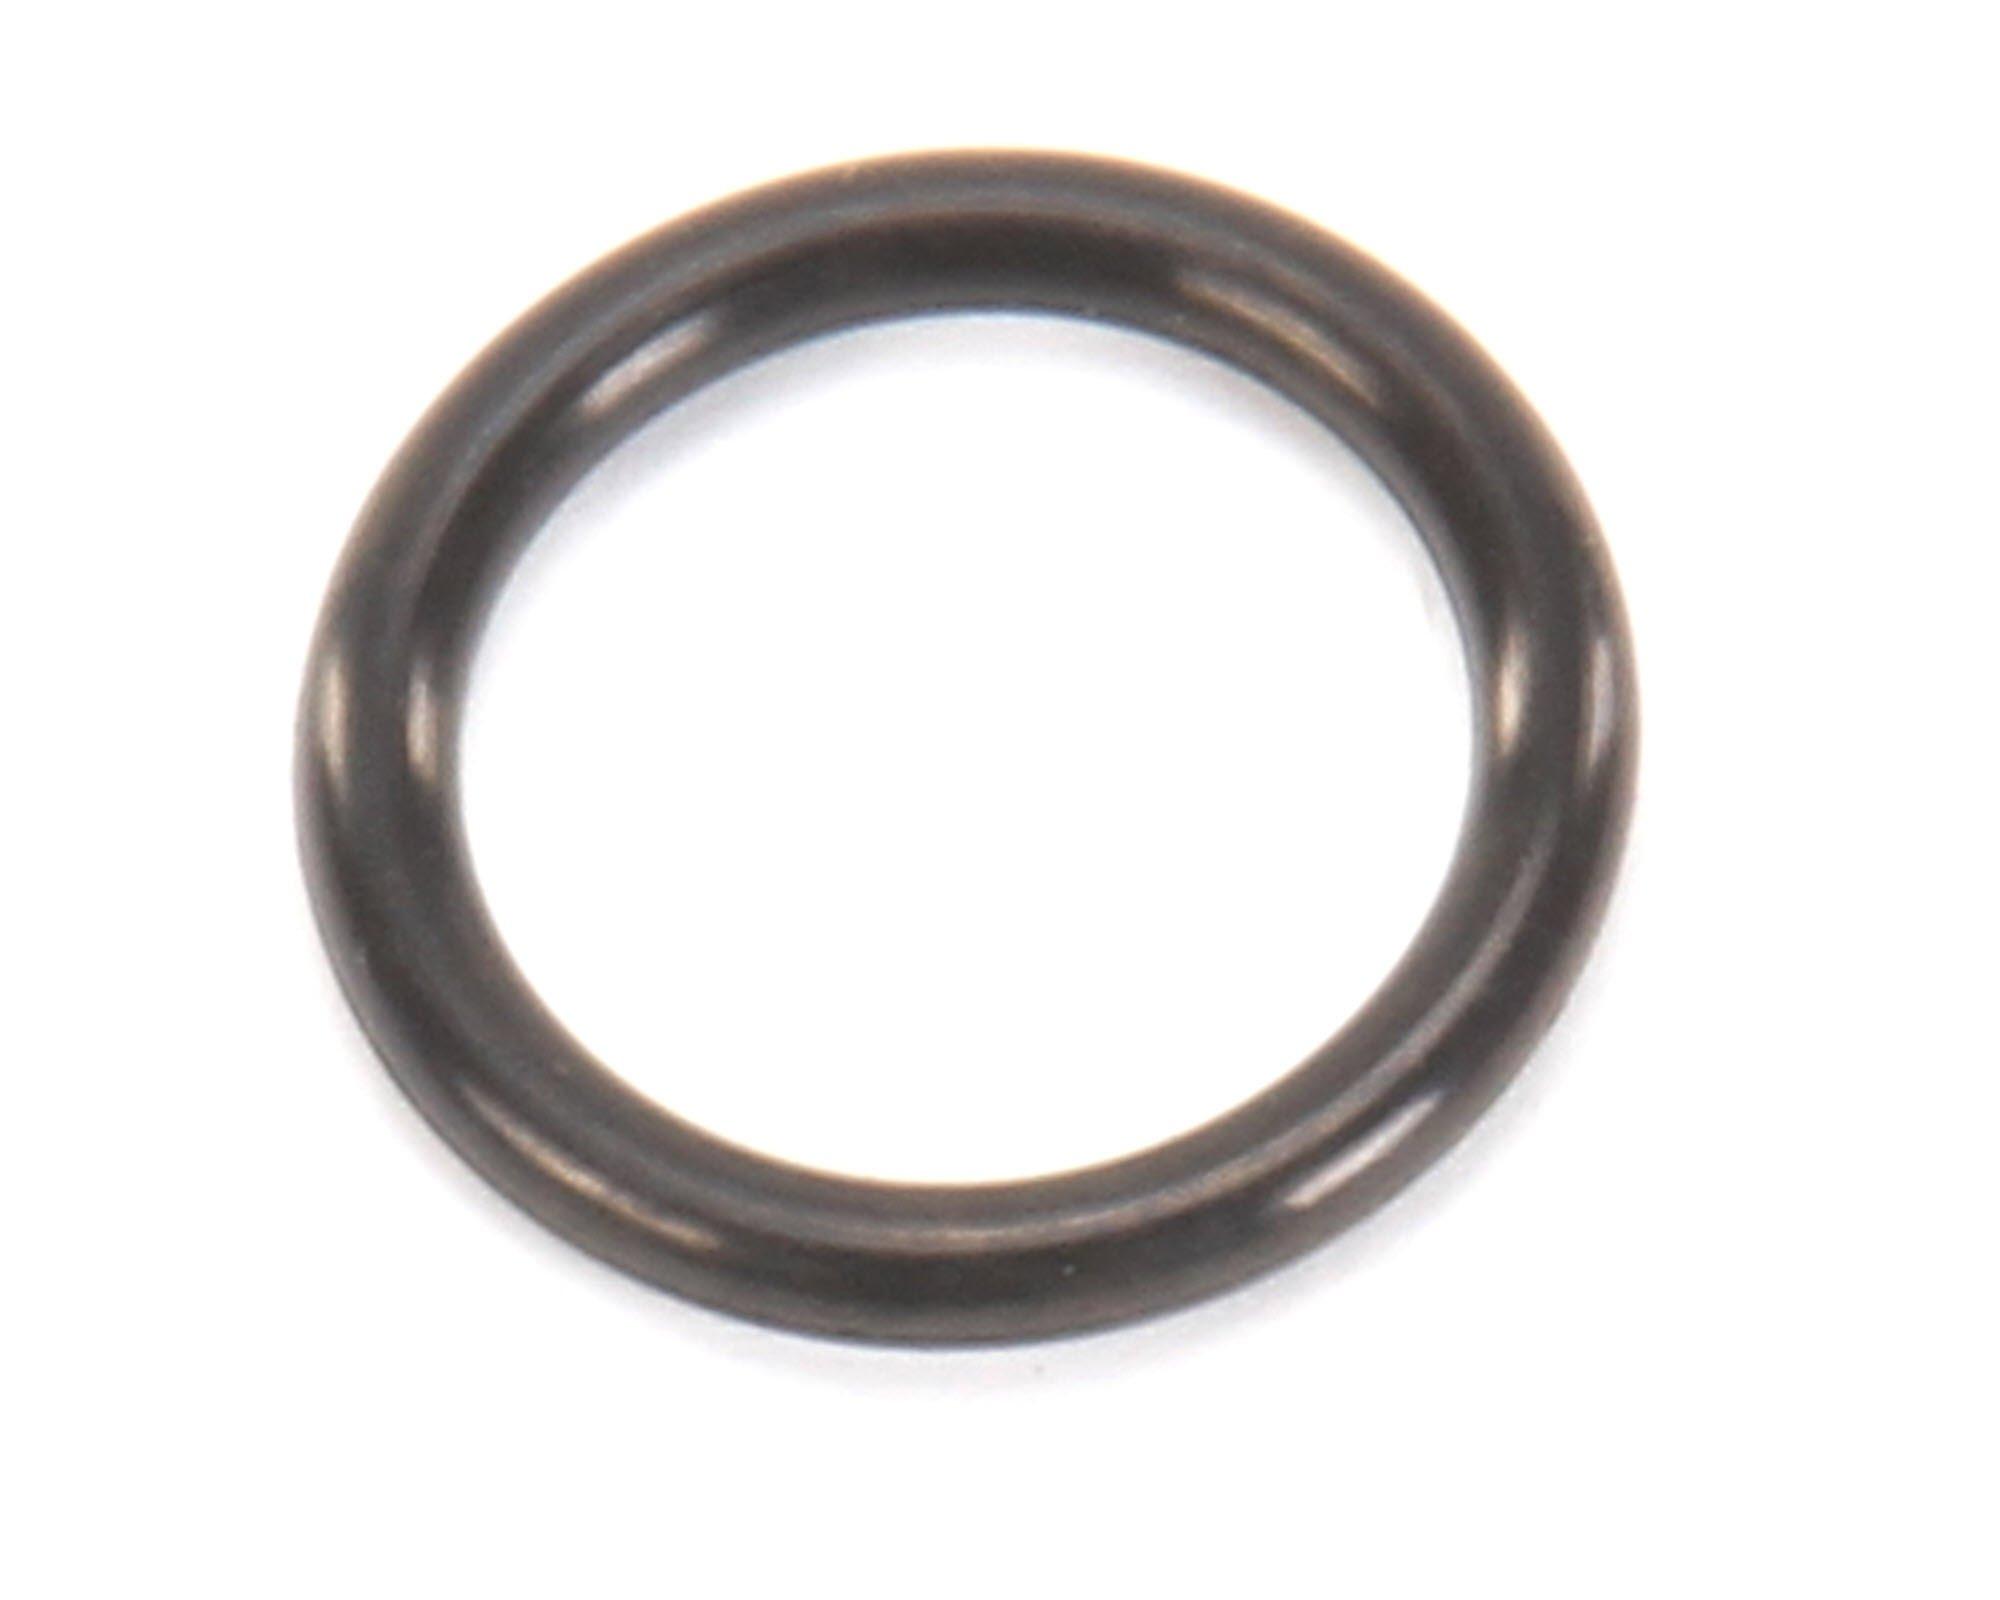 T&S Brass 001074-45 Swivel Nozzle O-Ring